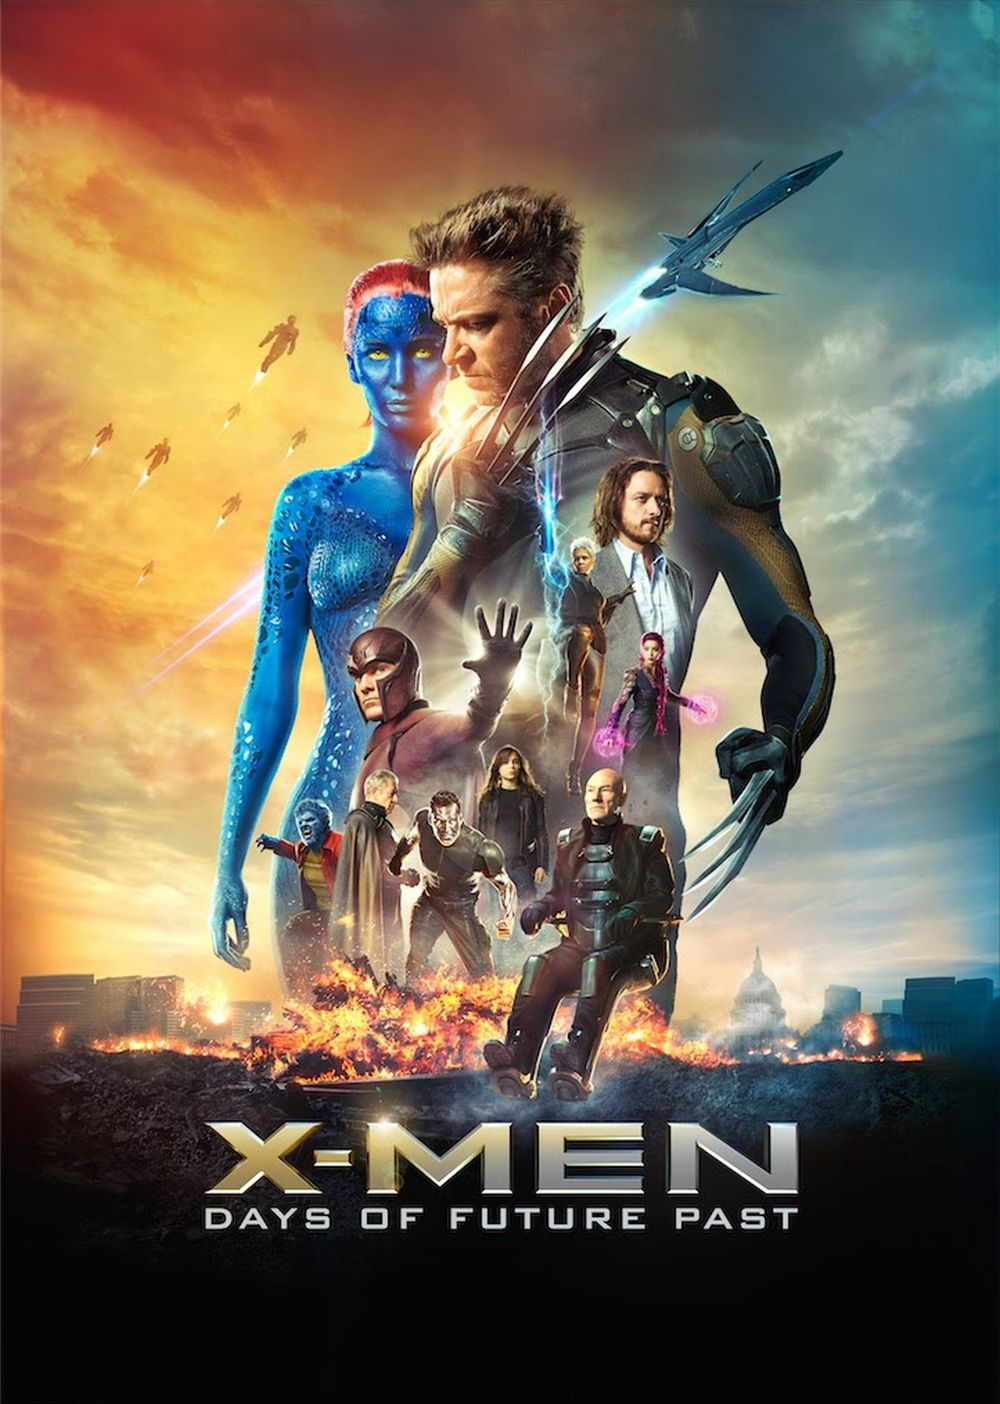 Twentieth Century Fox / Marvel Entertainment